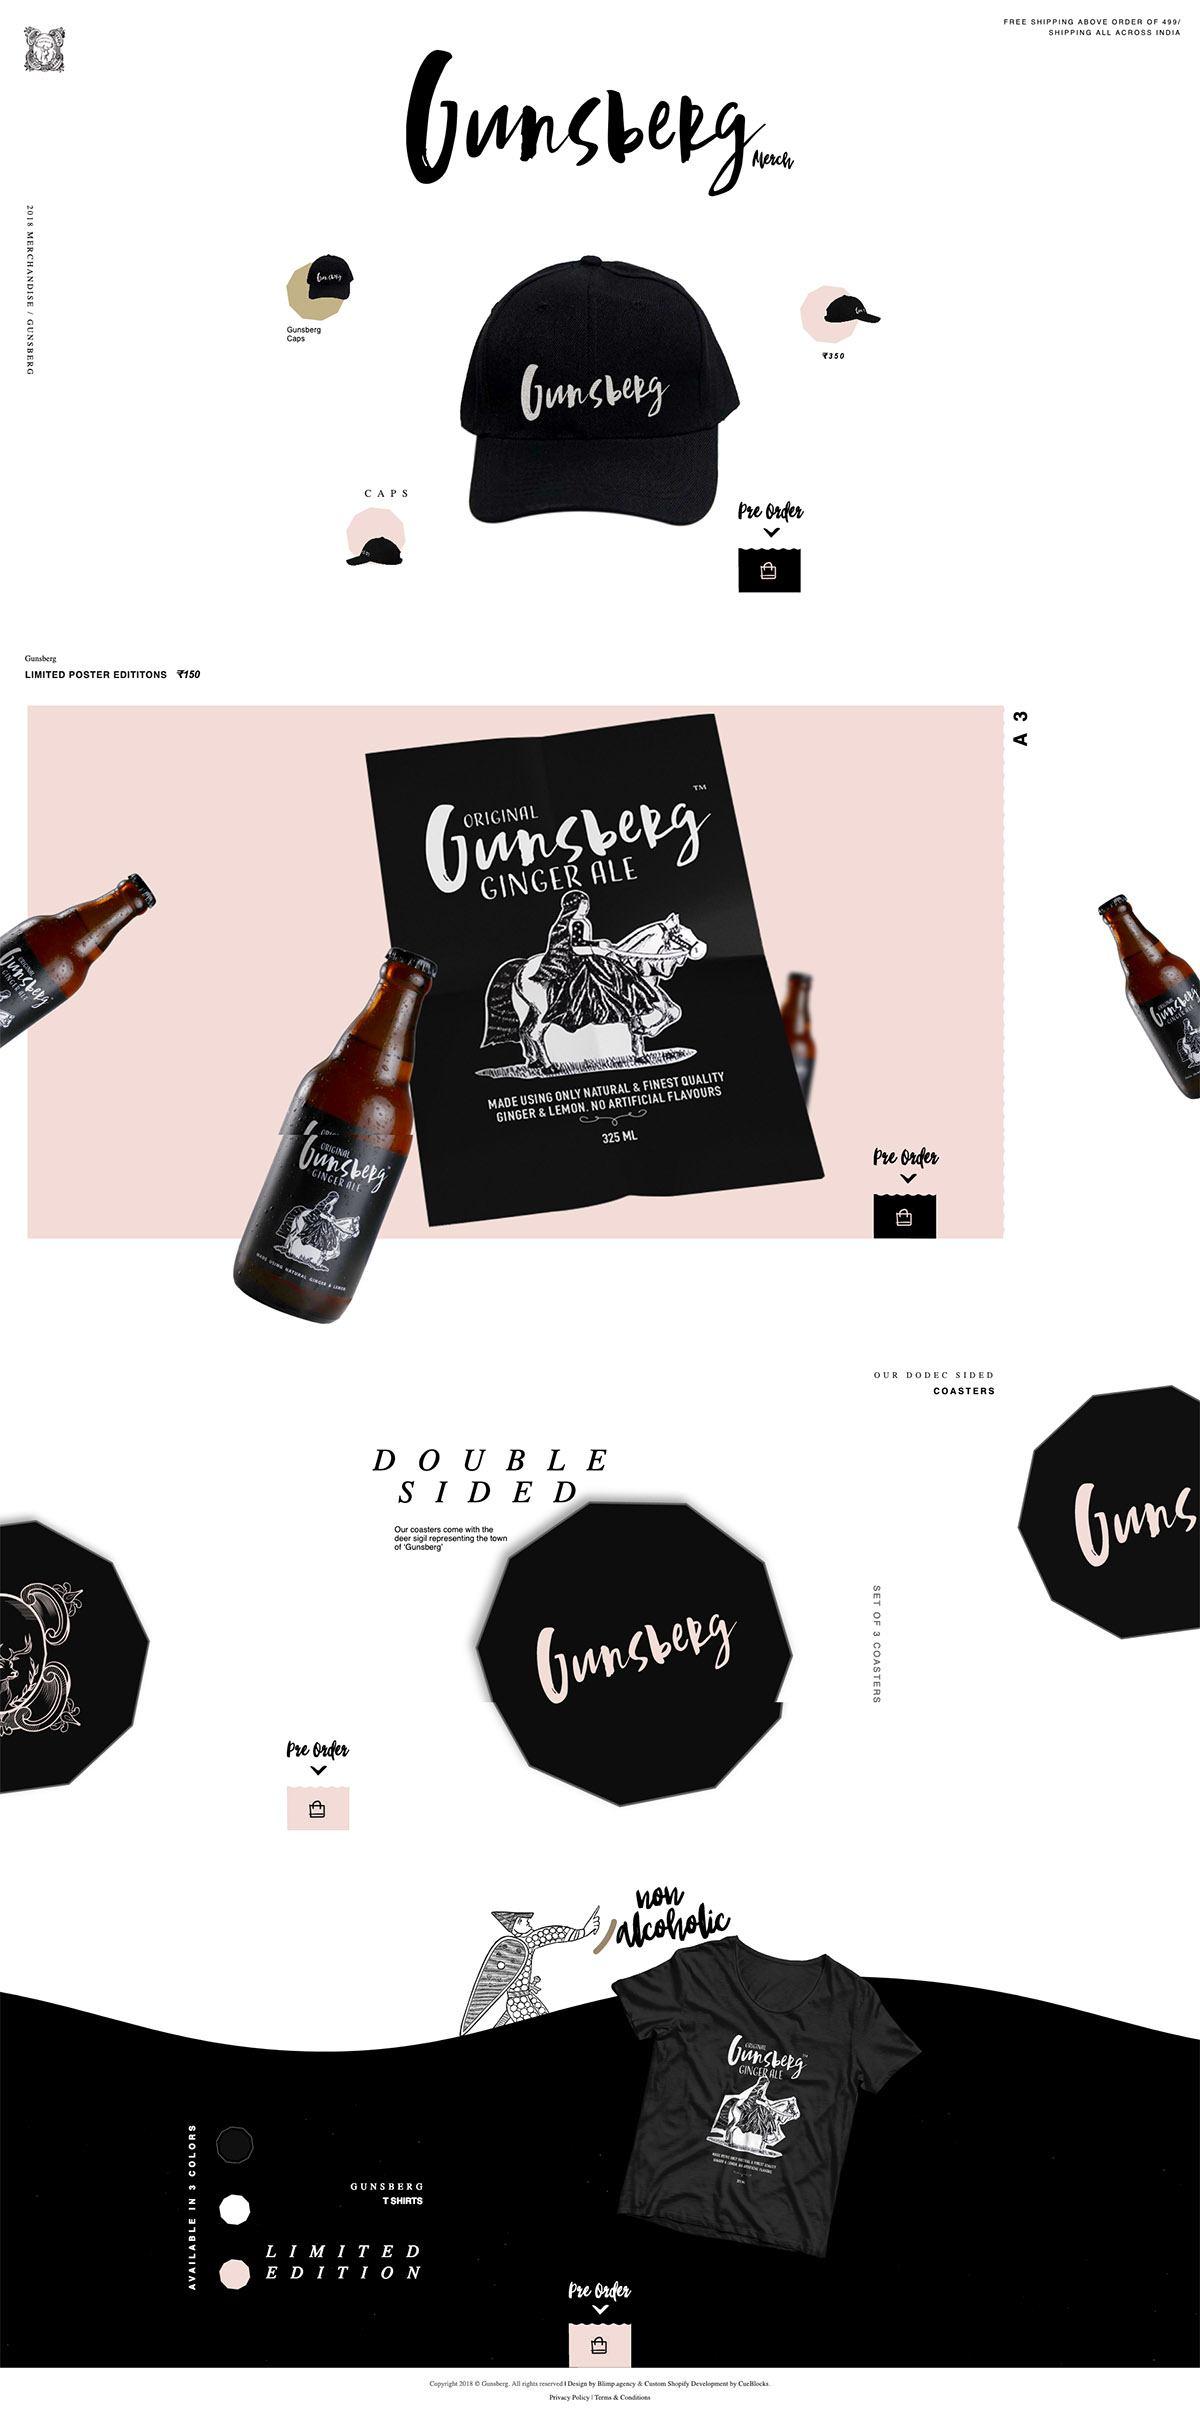 eCommerce website: Gunsberg Merch